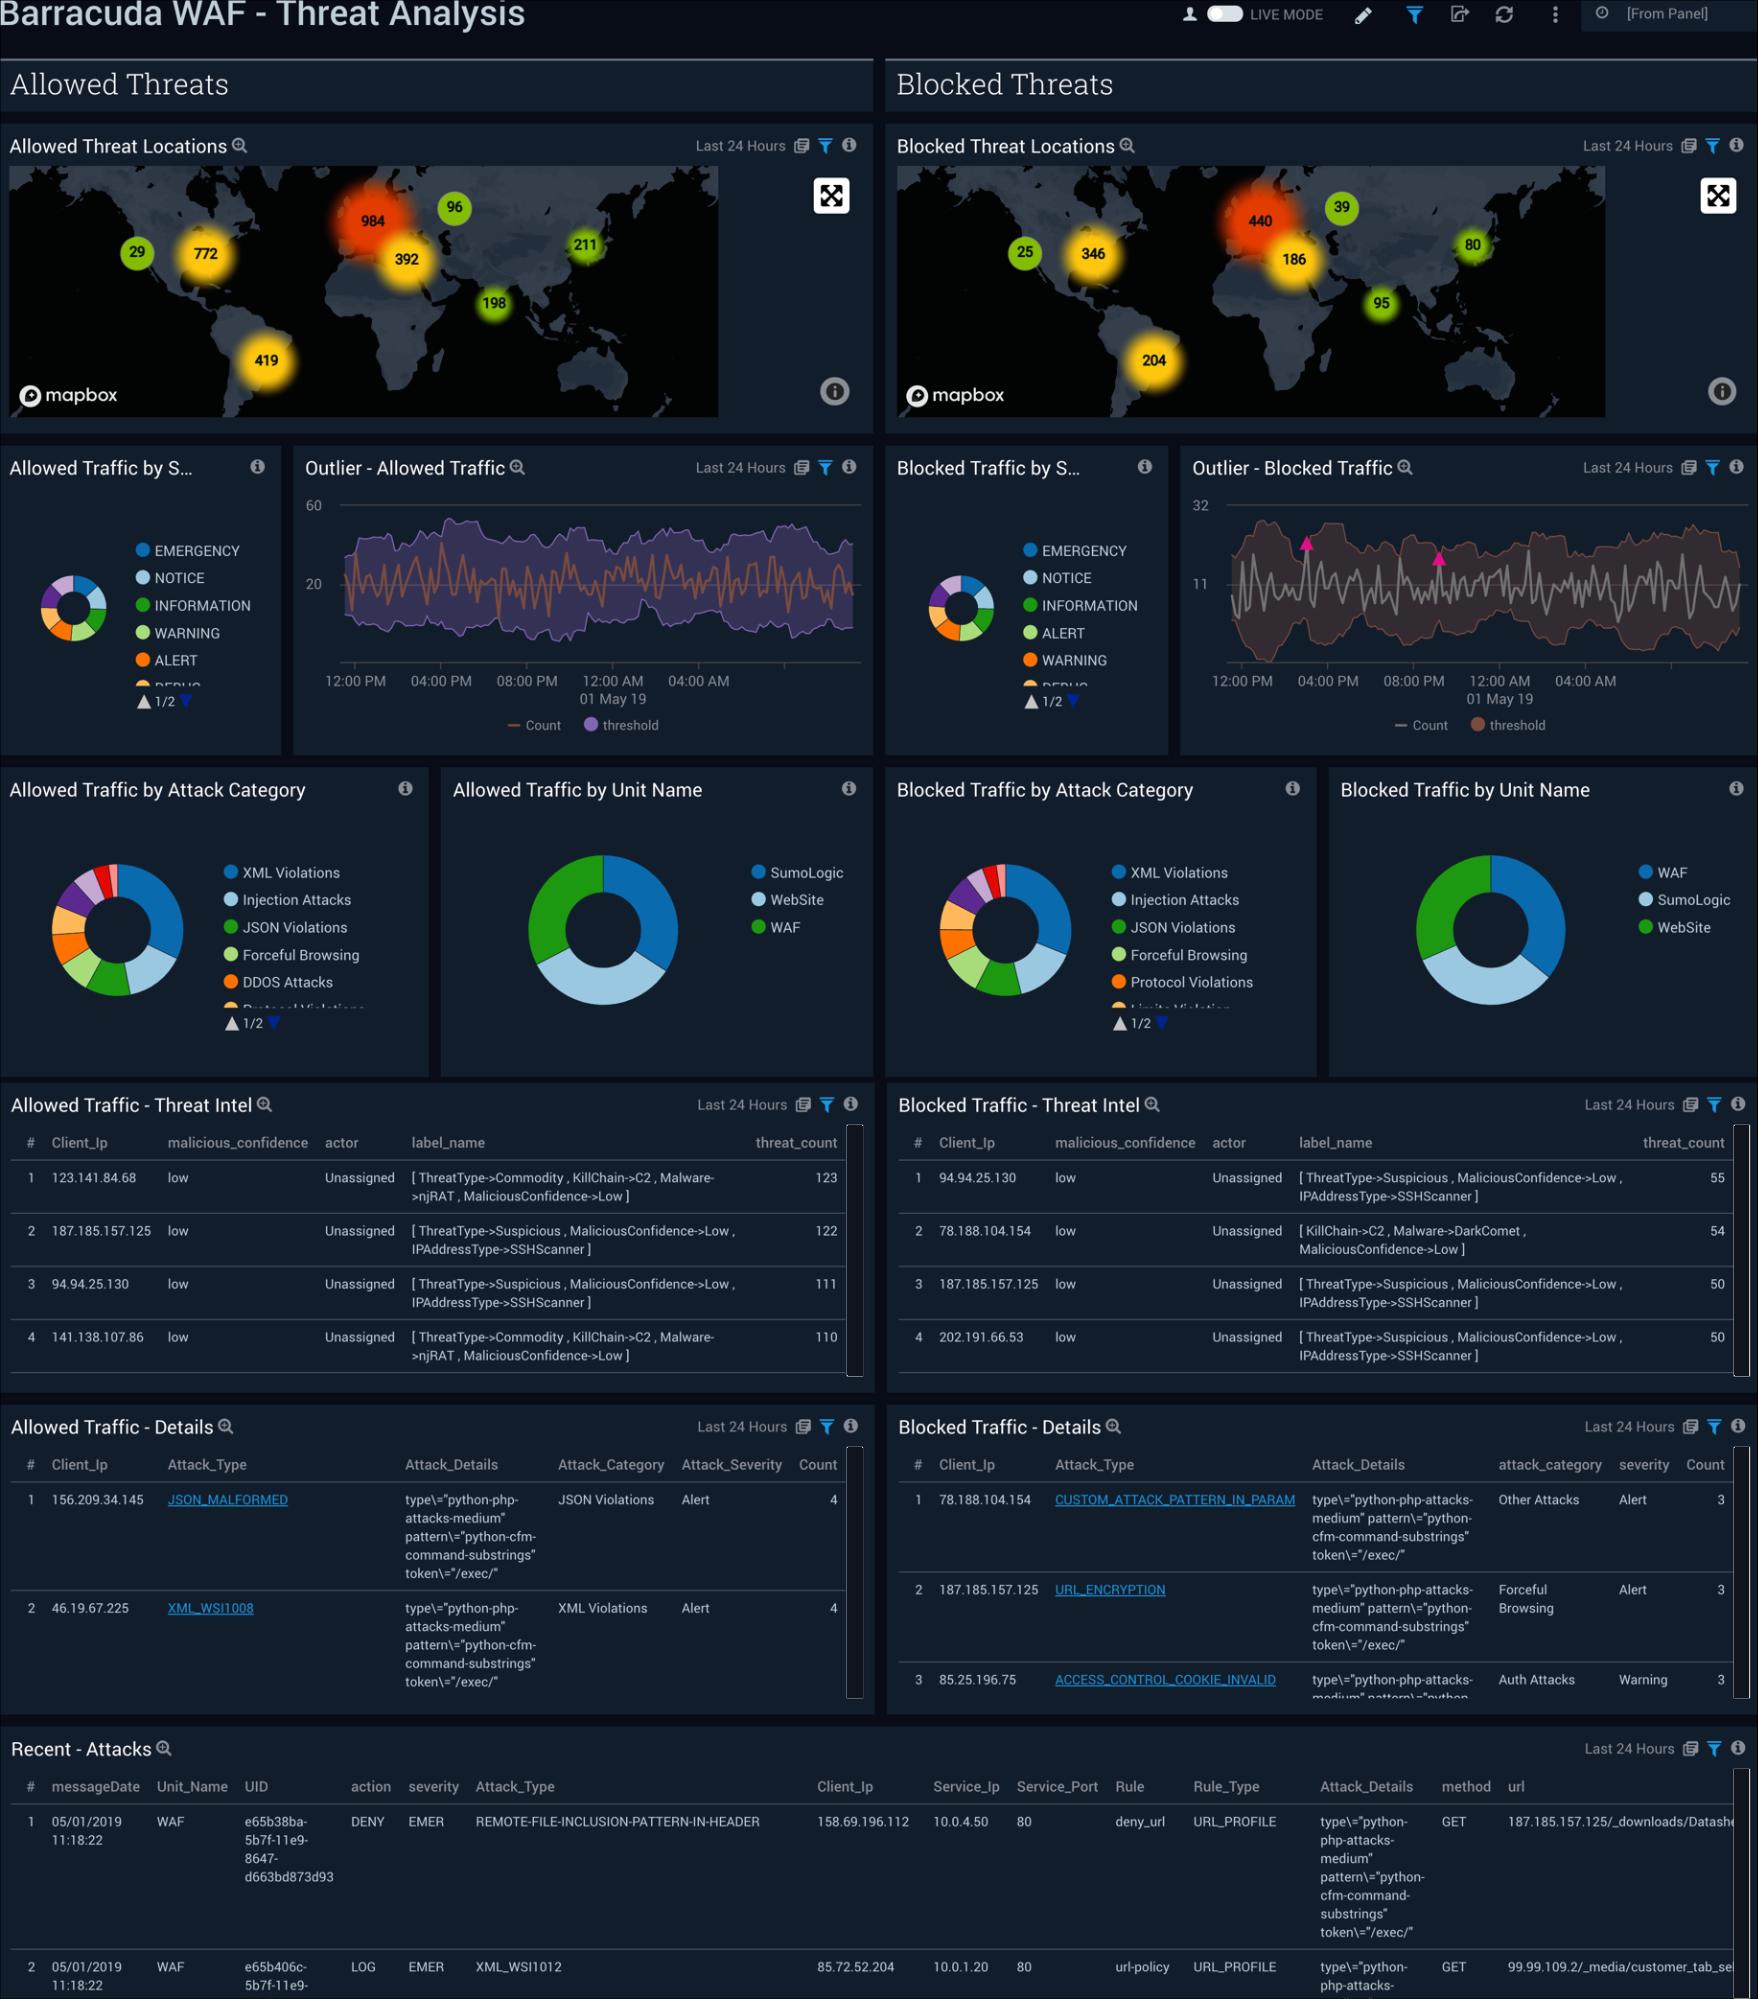 Analyze Threats